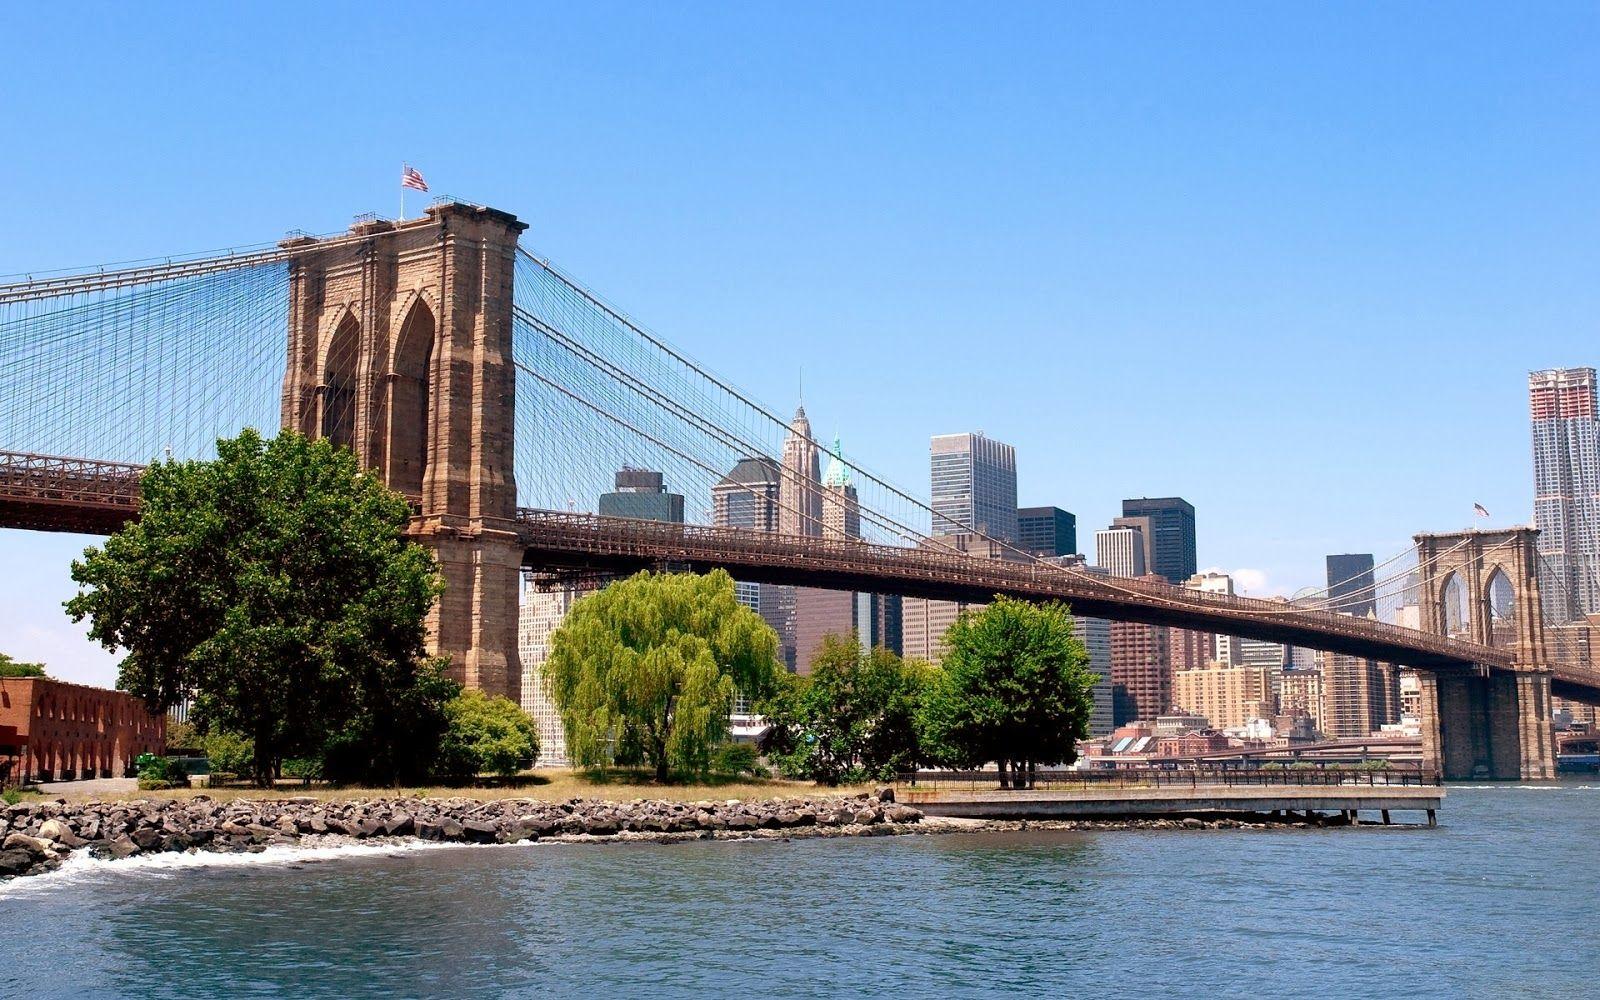 Desktop Hd Wallpapers Free Downloads Beautiful Bridges In Nights Hd Wallpapers New York Travel Guide New York Wallpaper New York Travel